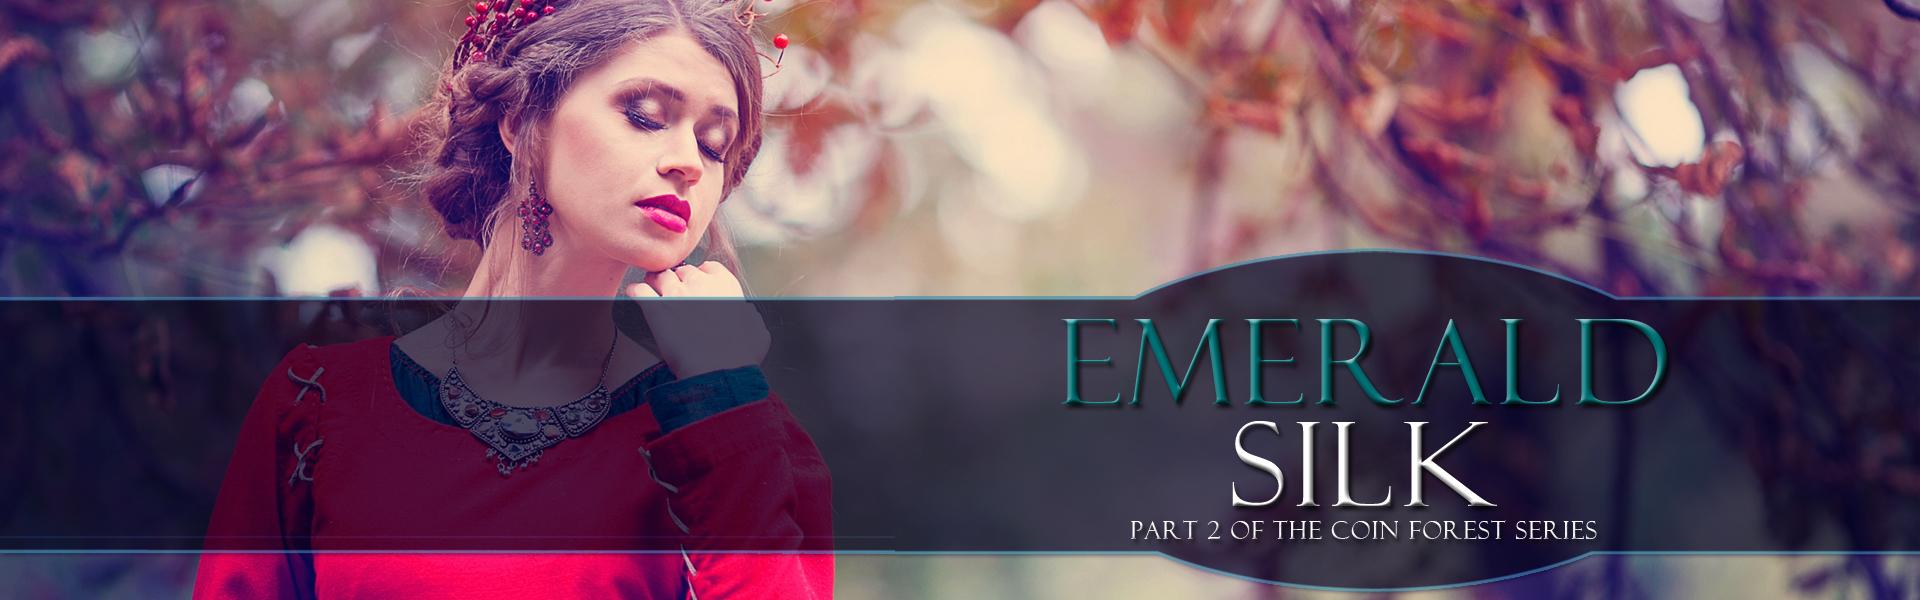 Permalink to: Emerald Silk